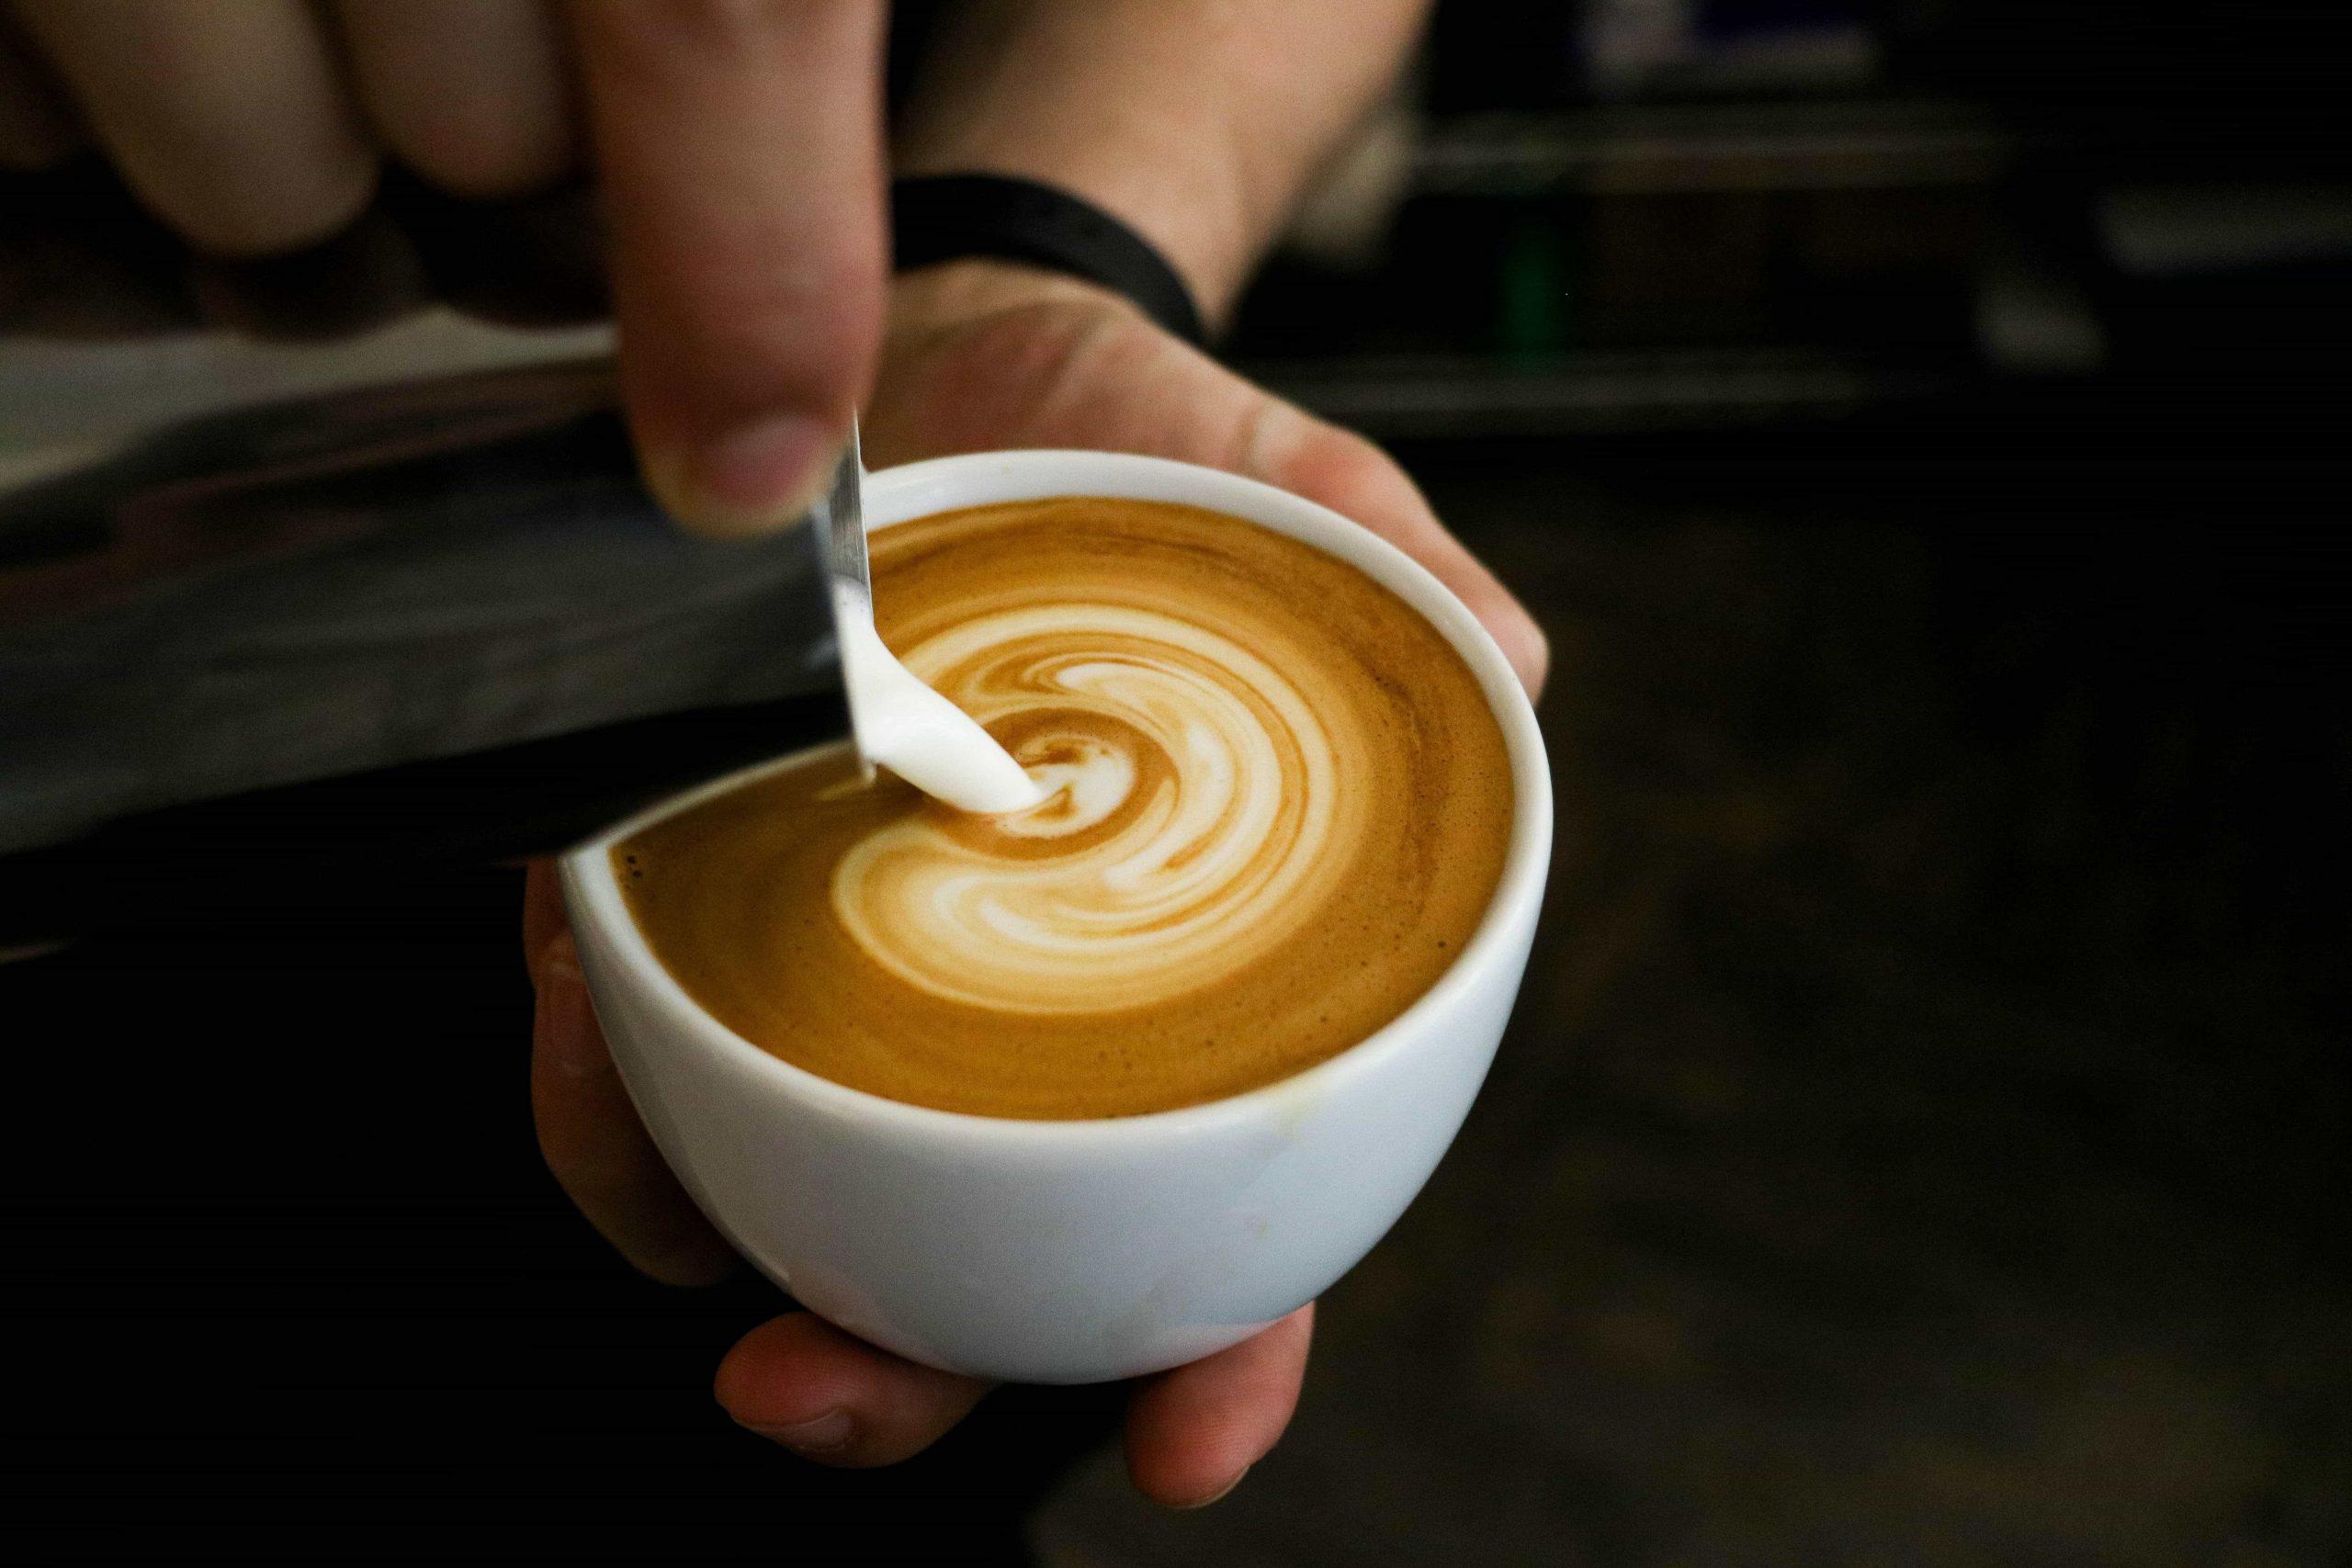 Keurig K Mini Plus vs Keurig K Mini coffee maker